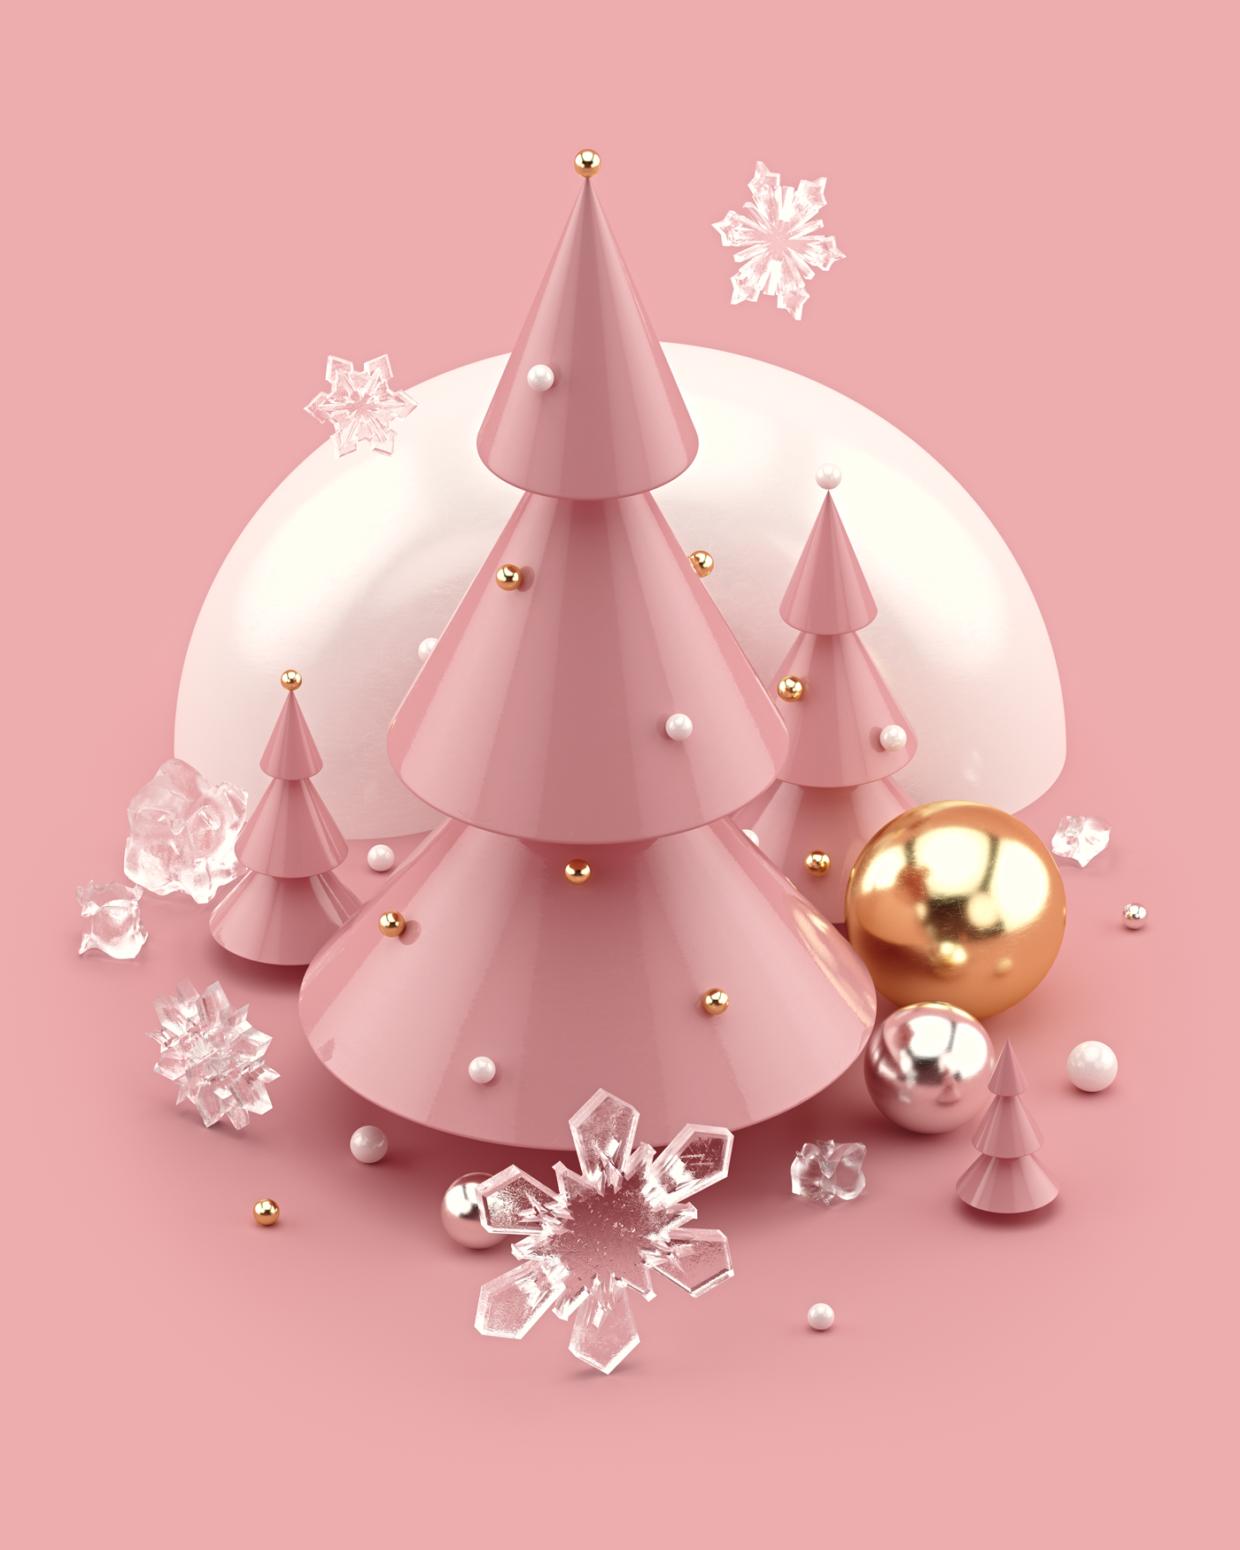 Christmas 3d Illustrations By Alexey Boldin Christmas Design 3d Illustration Christmas Scene